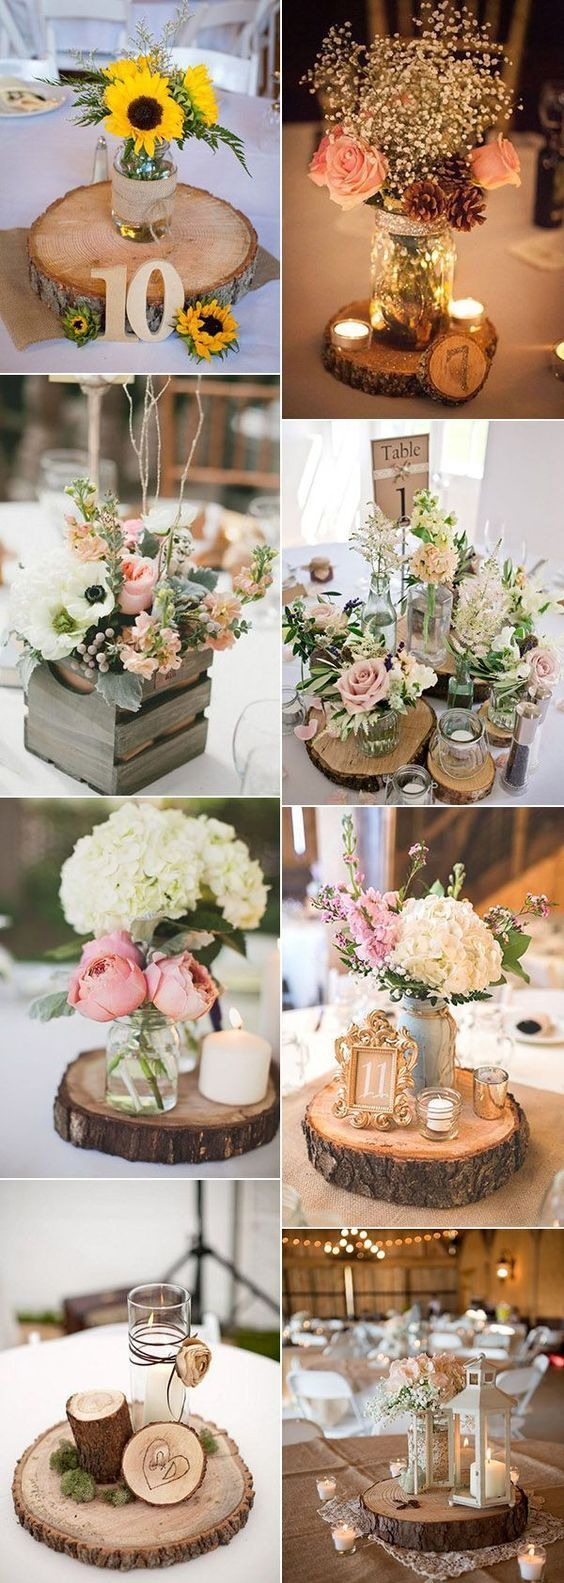 wood themed wedding centerpieces for rustic wedding ideas 2017 trends https://www.kzndj.wedding